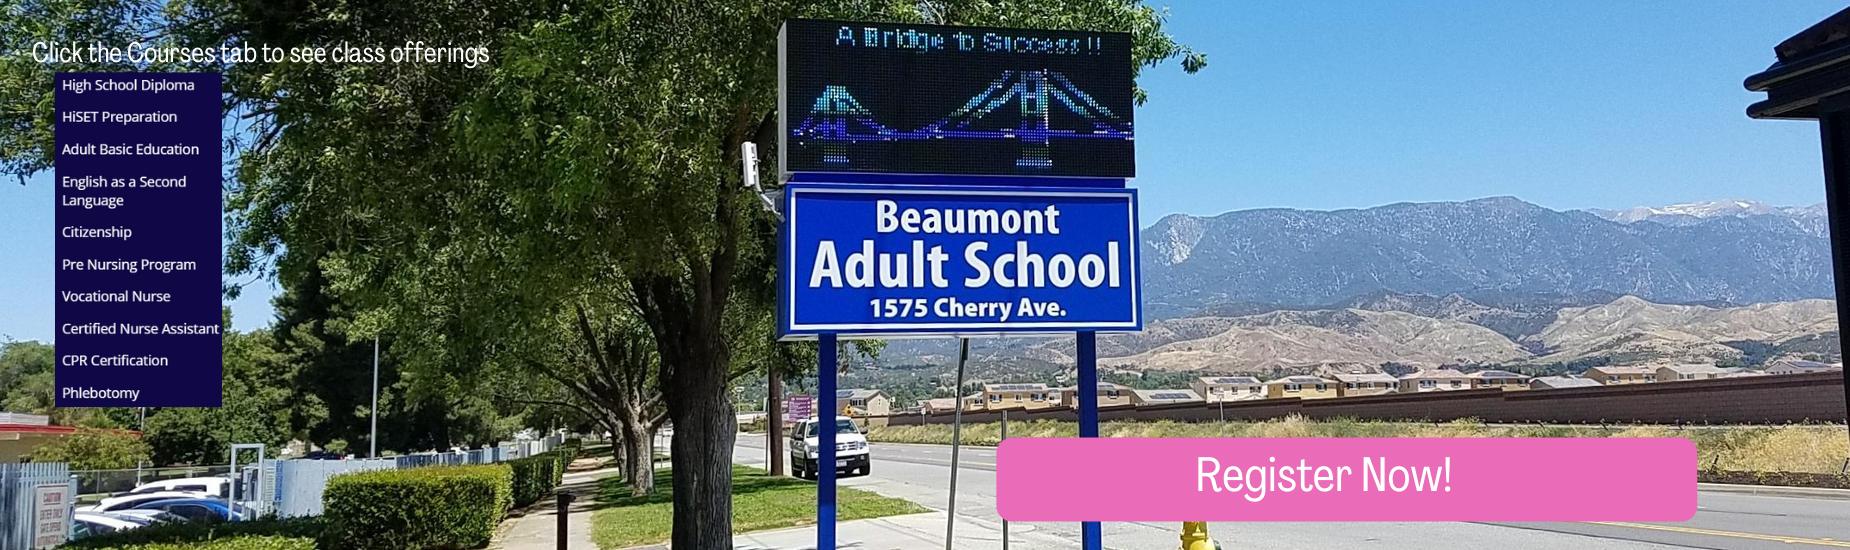 Beaumont Adult School Marquee